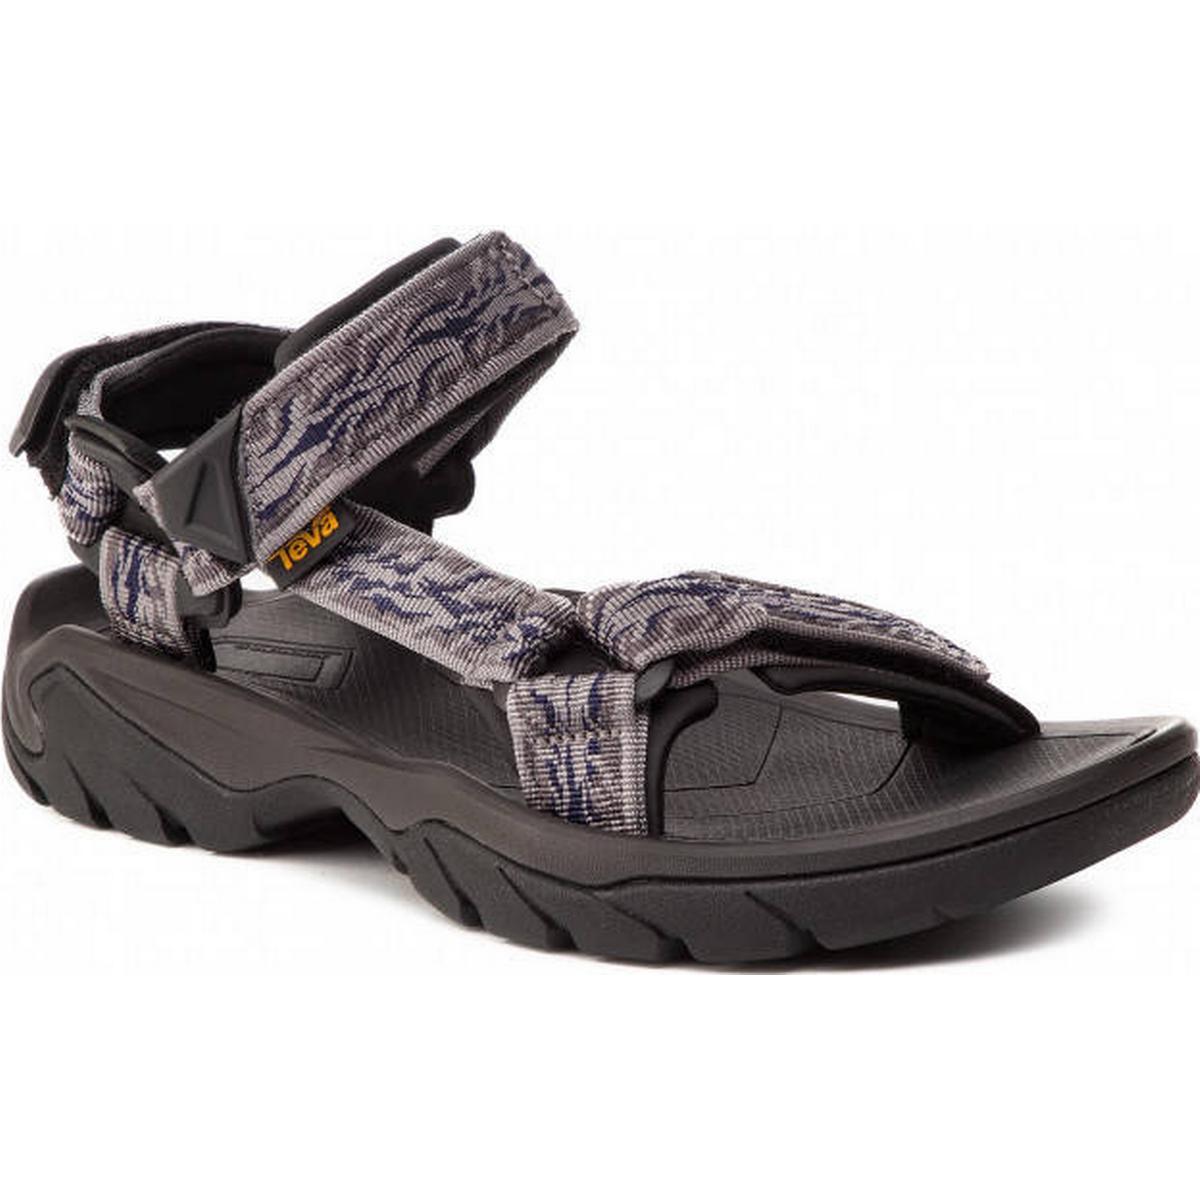 Teva sandal herr Skor Jämför priser på PriceRunner